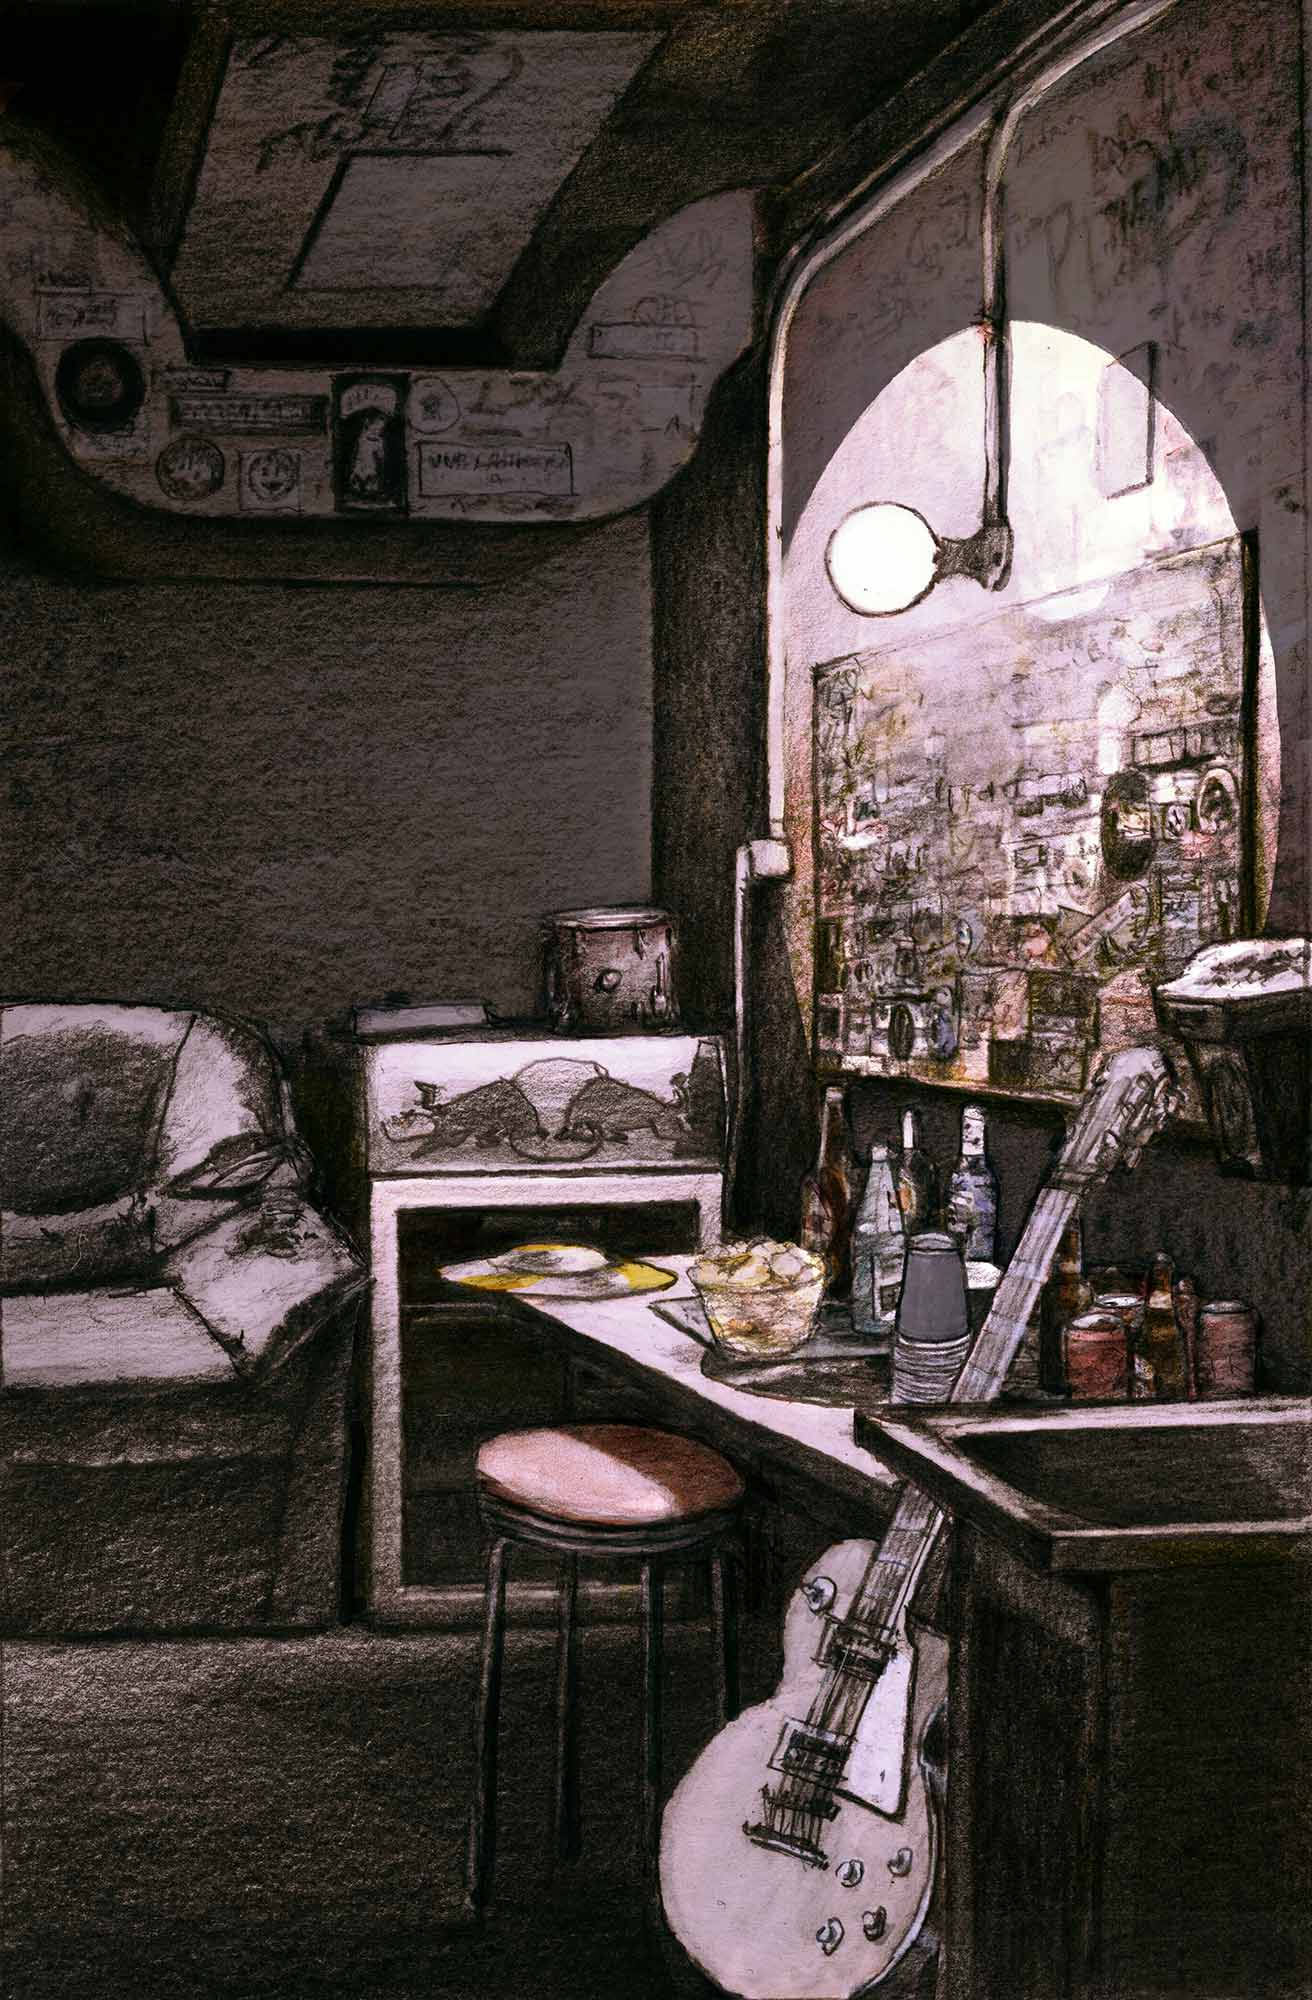 Mario Jodra Book Cover Art - Toma de tierra. Libros del K.O (publisher) 2021